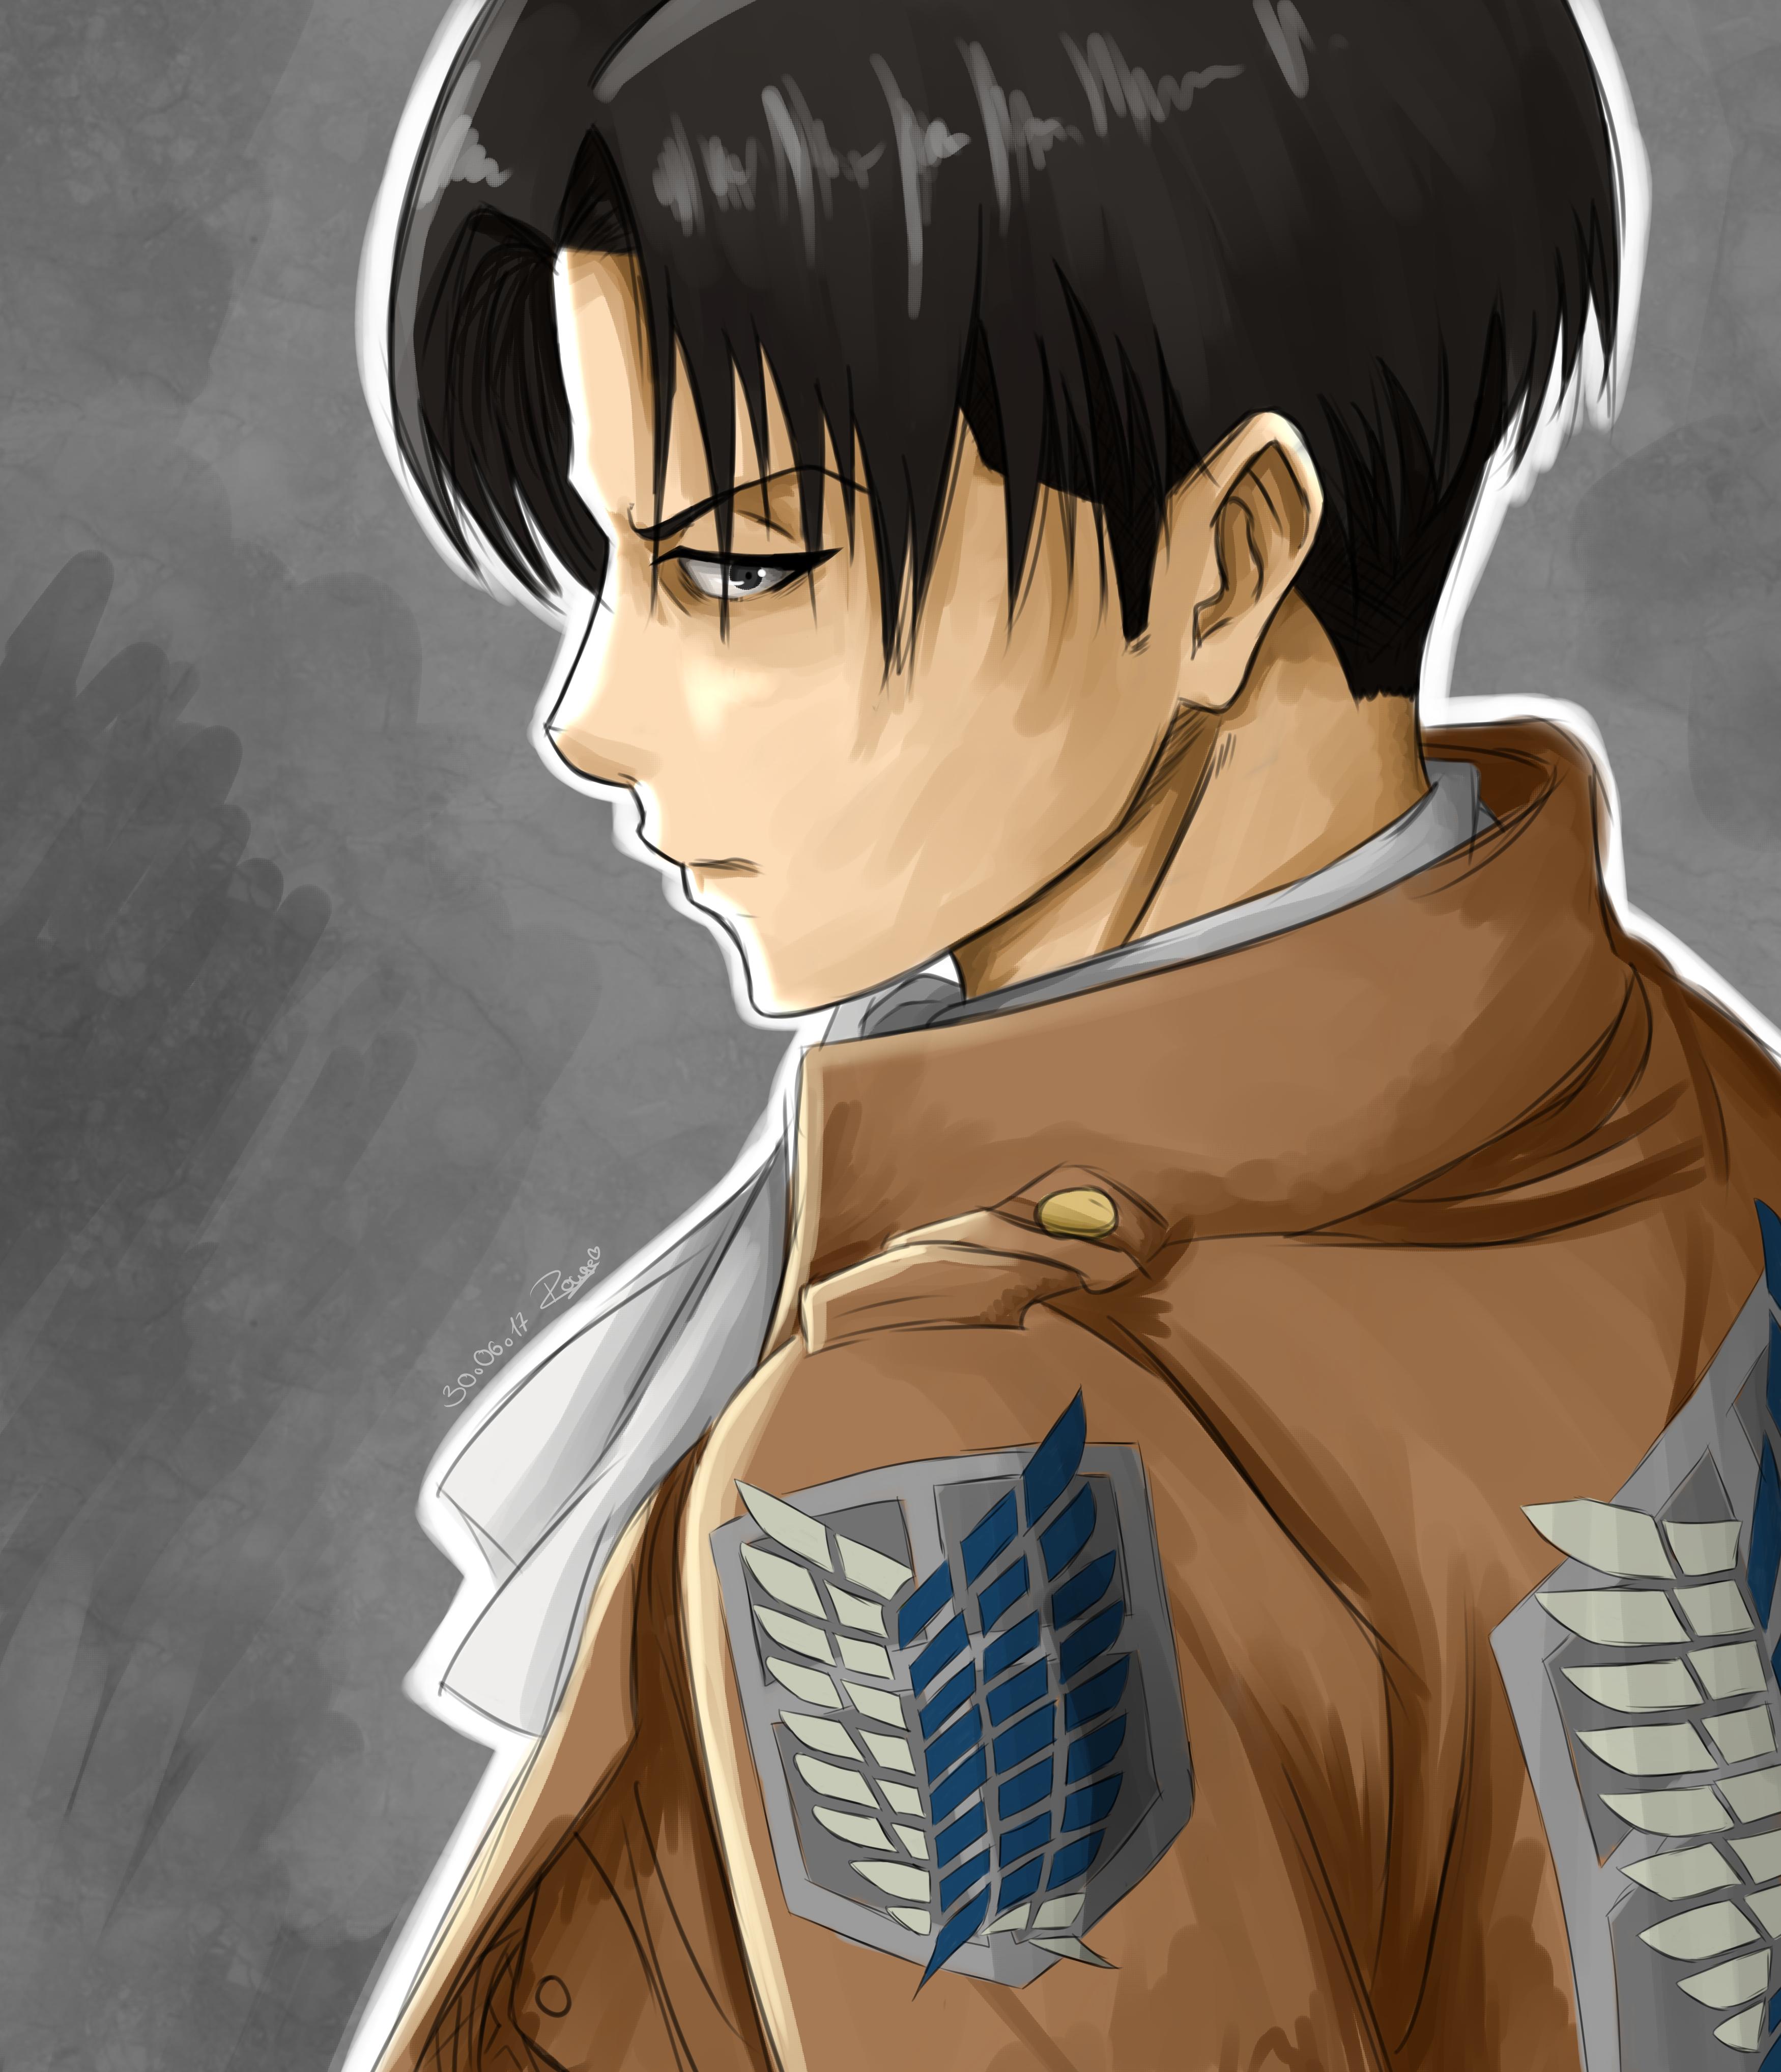 Read Manga Online Free: Attack On Titan